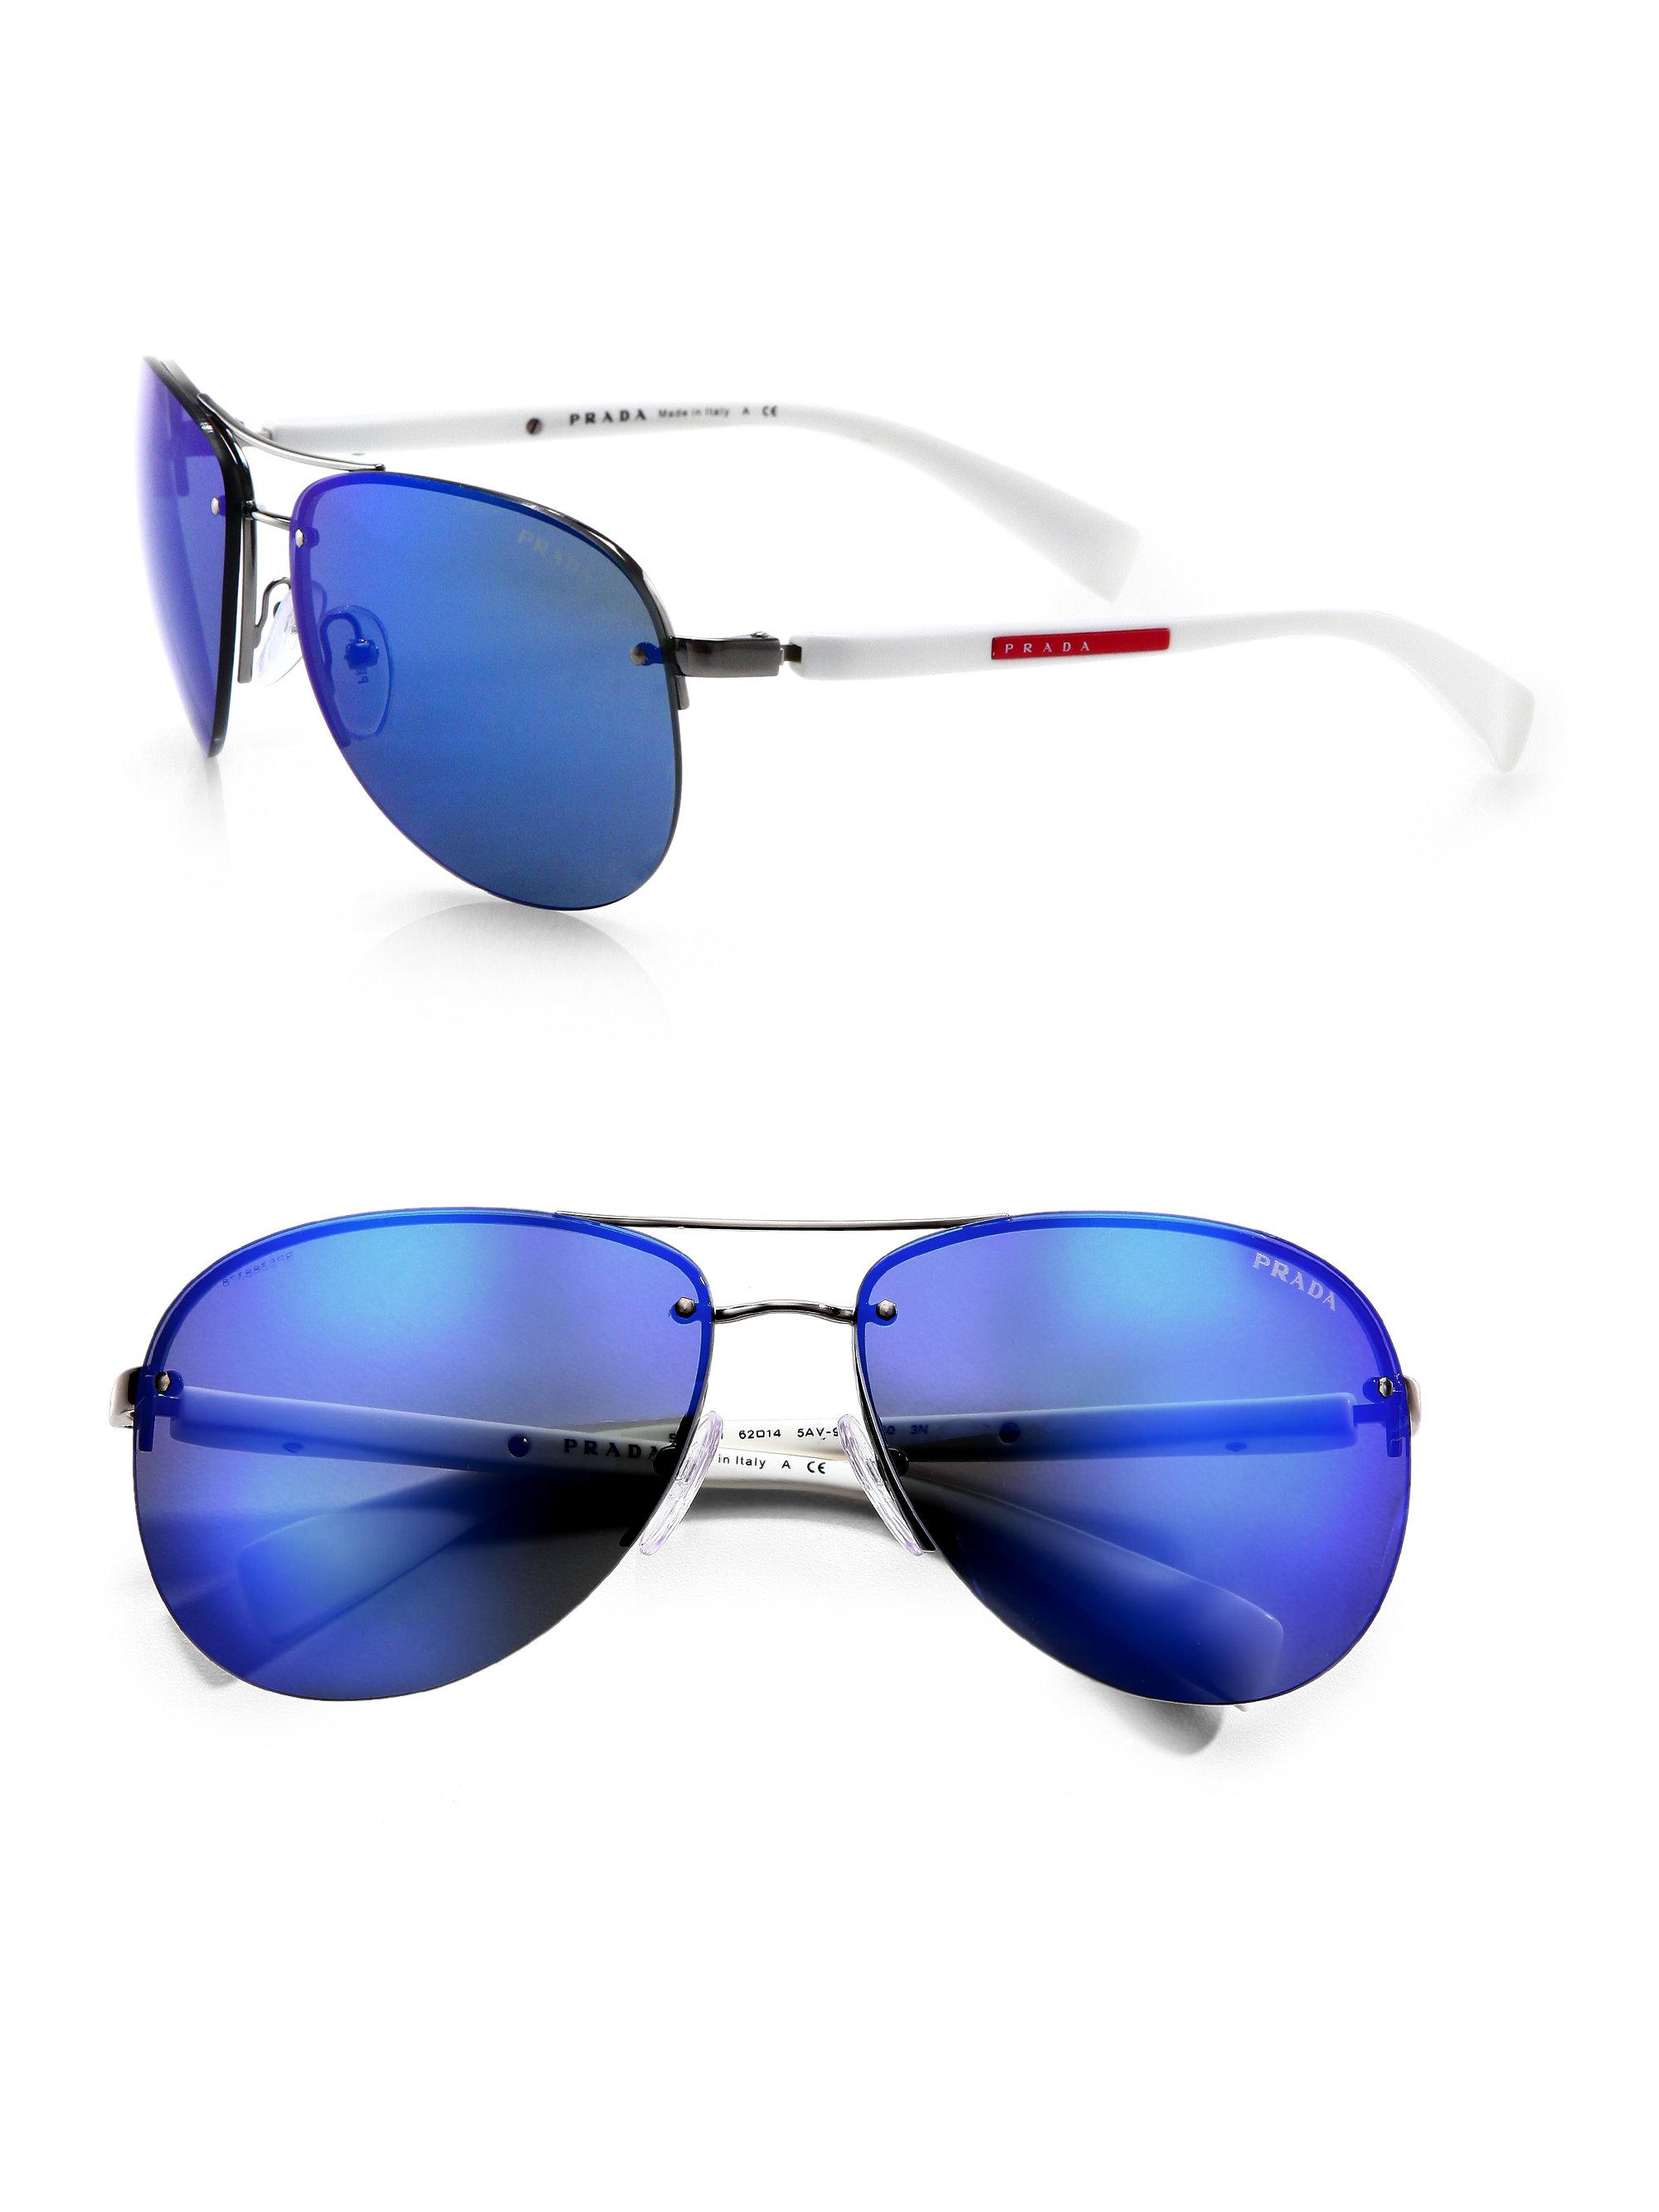 658cdd0250c67 ... spain lyst prada metal aviator sunglasses in blue for men e468c 7bfe9